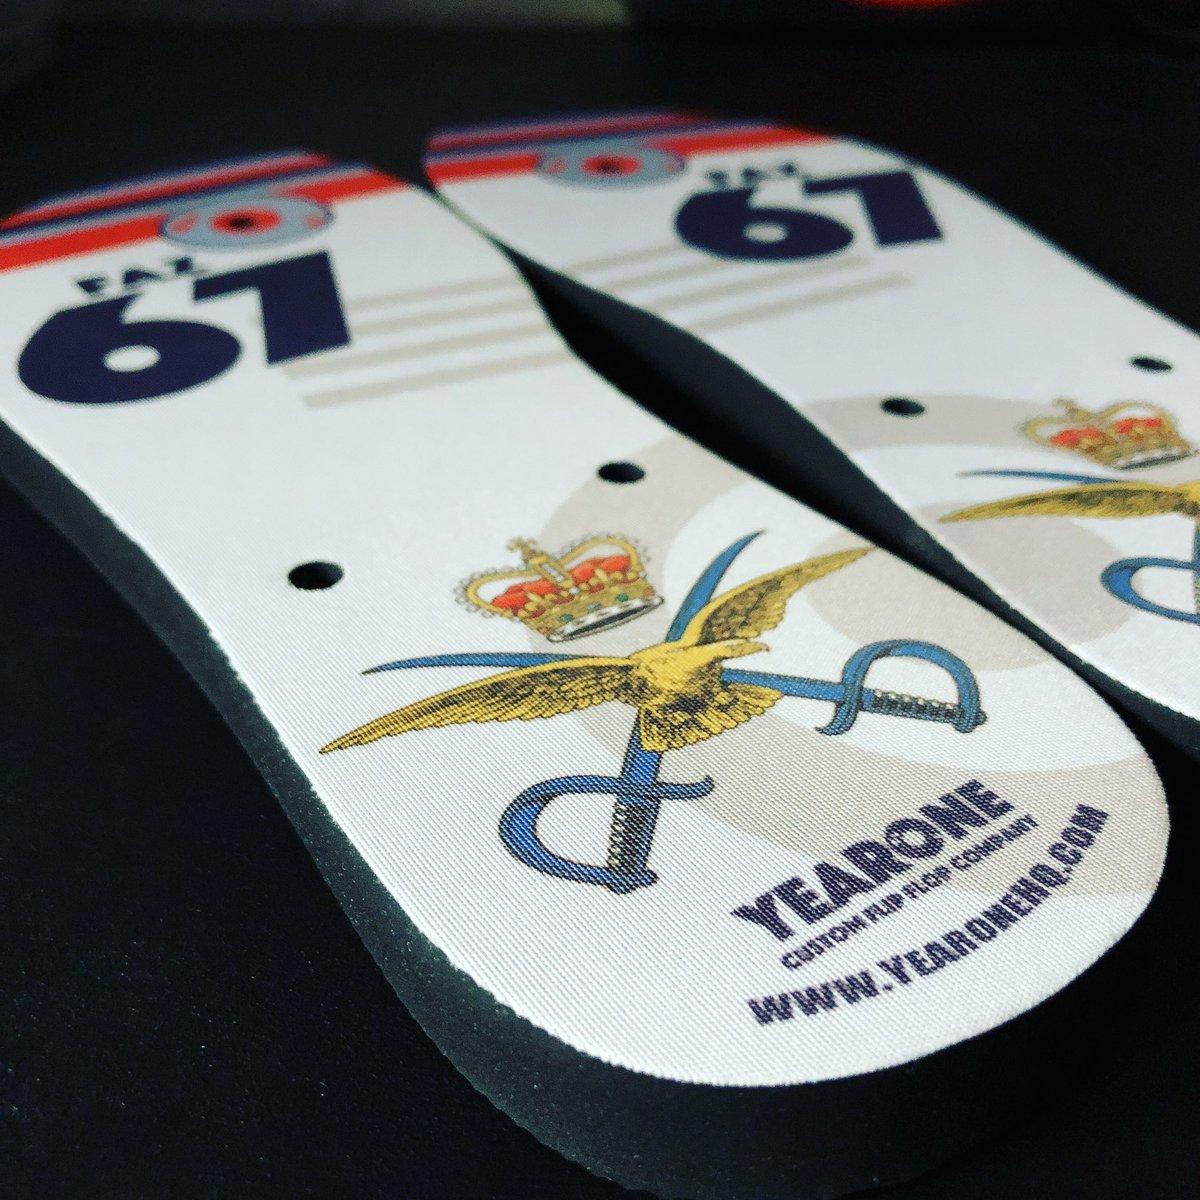 c5c51bb8d10a Yearone Custom Flip Flops on Twitter